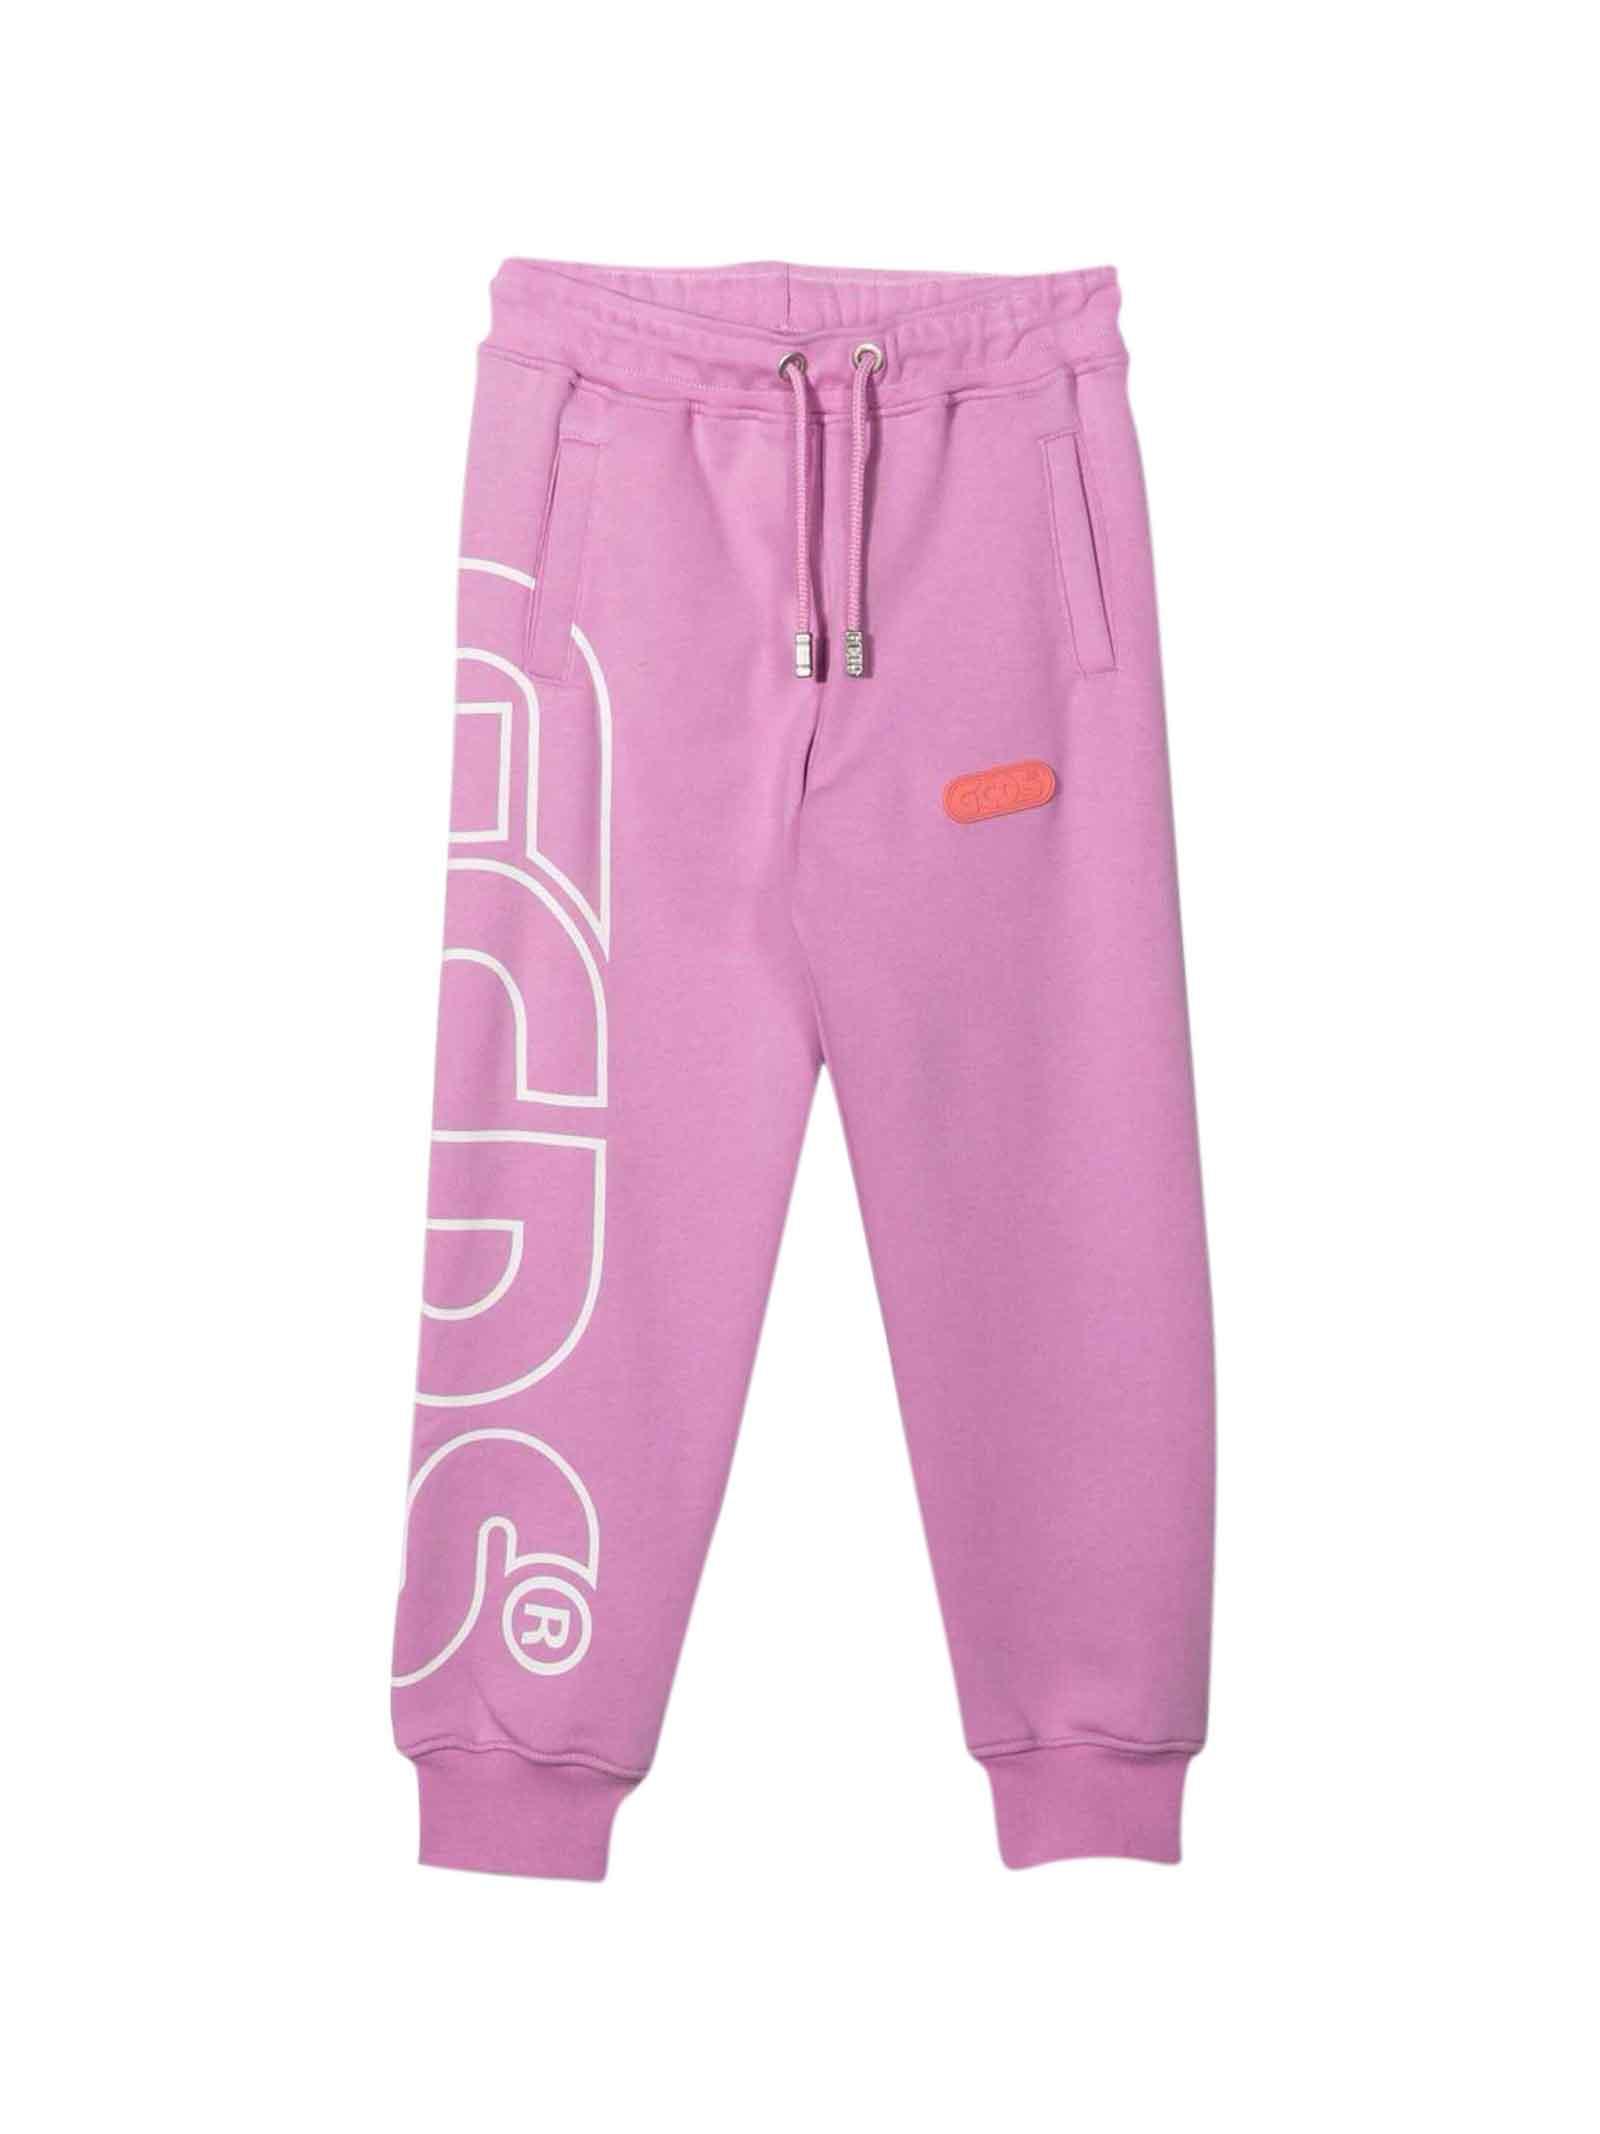 Lilac Jogging Pants